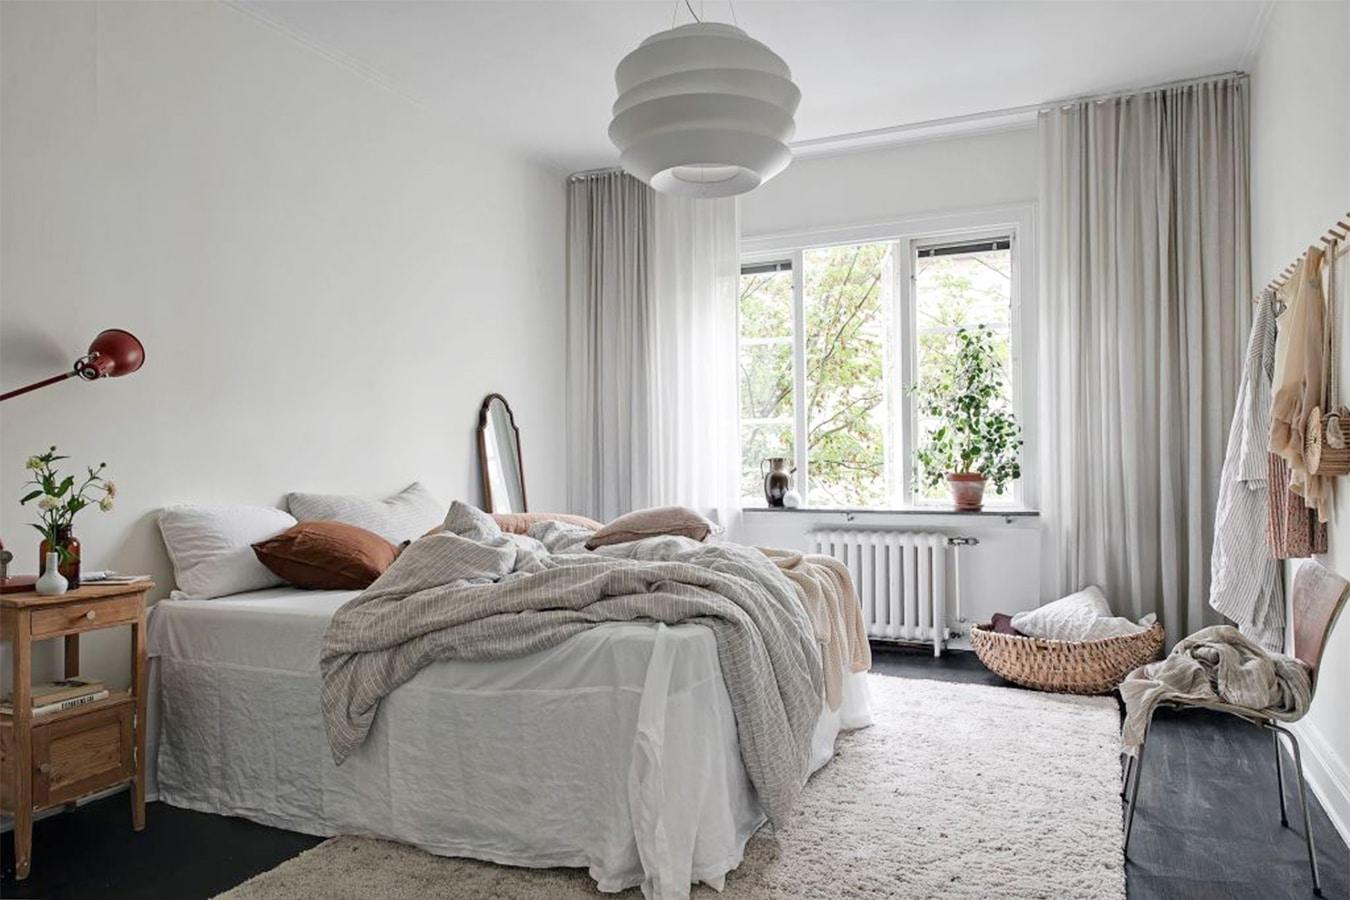 Les codes de la décoration cosy